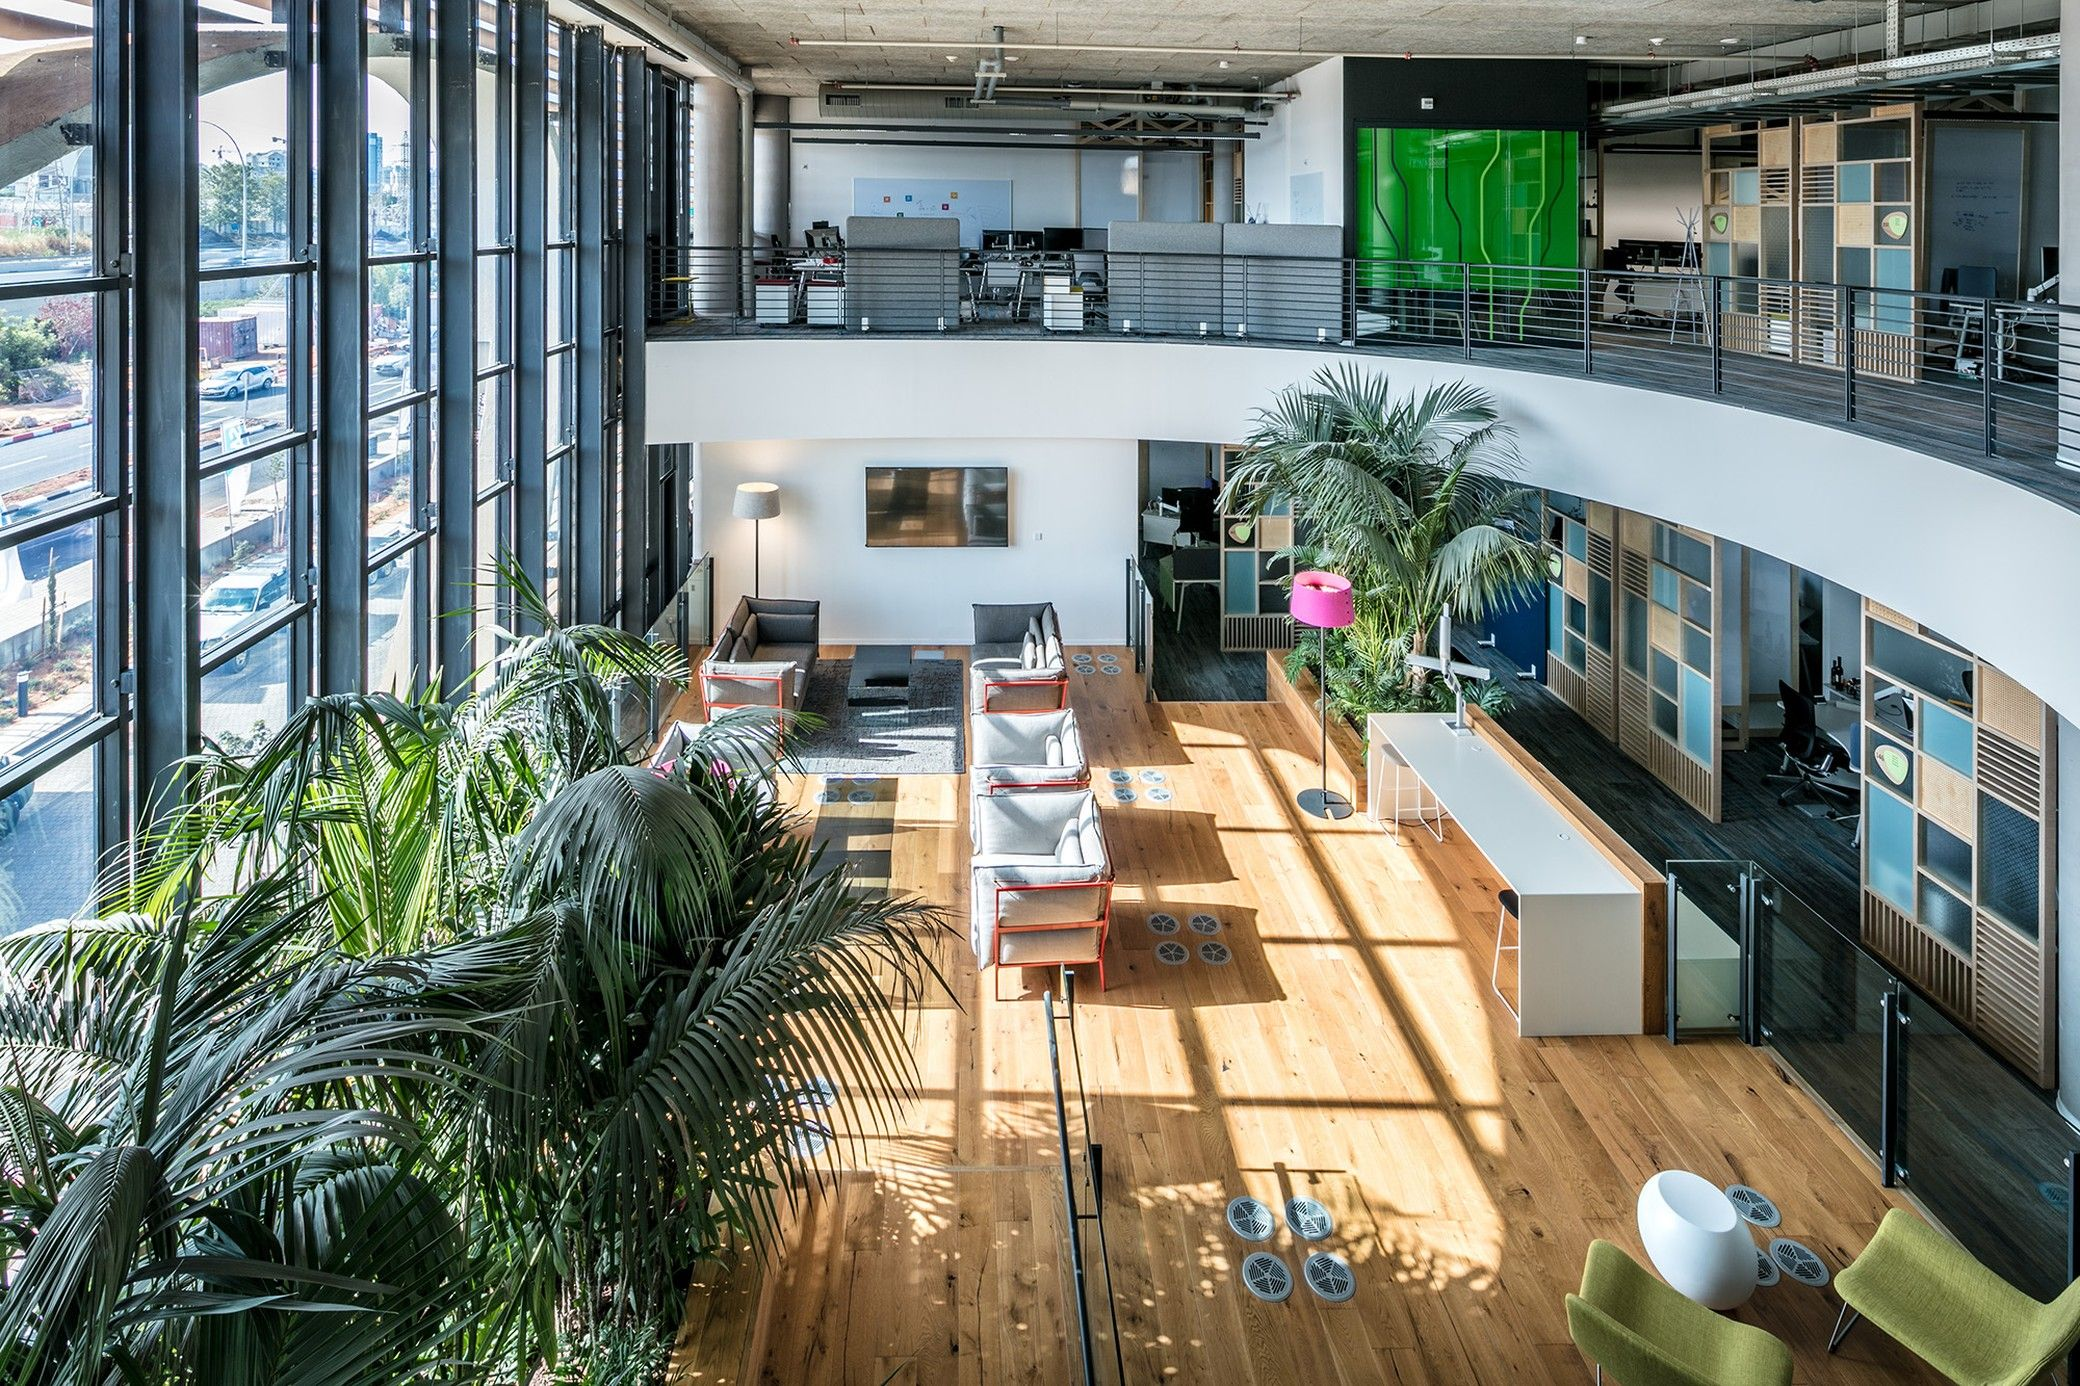 Sap Headquarters Yashar Architects Fascinating SAP Headquarters Interiors 5923 11